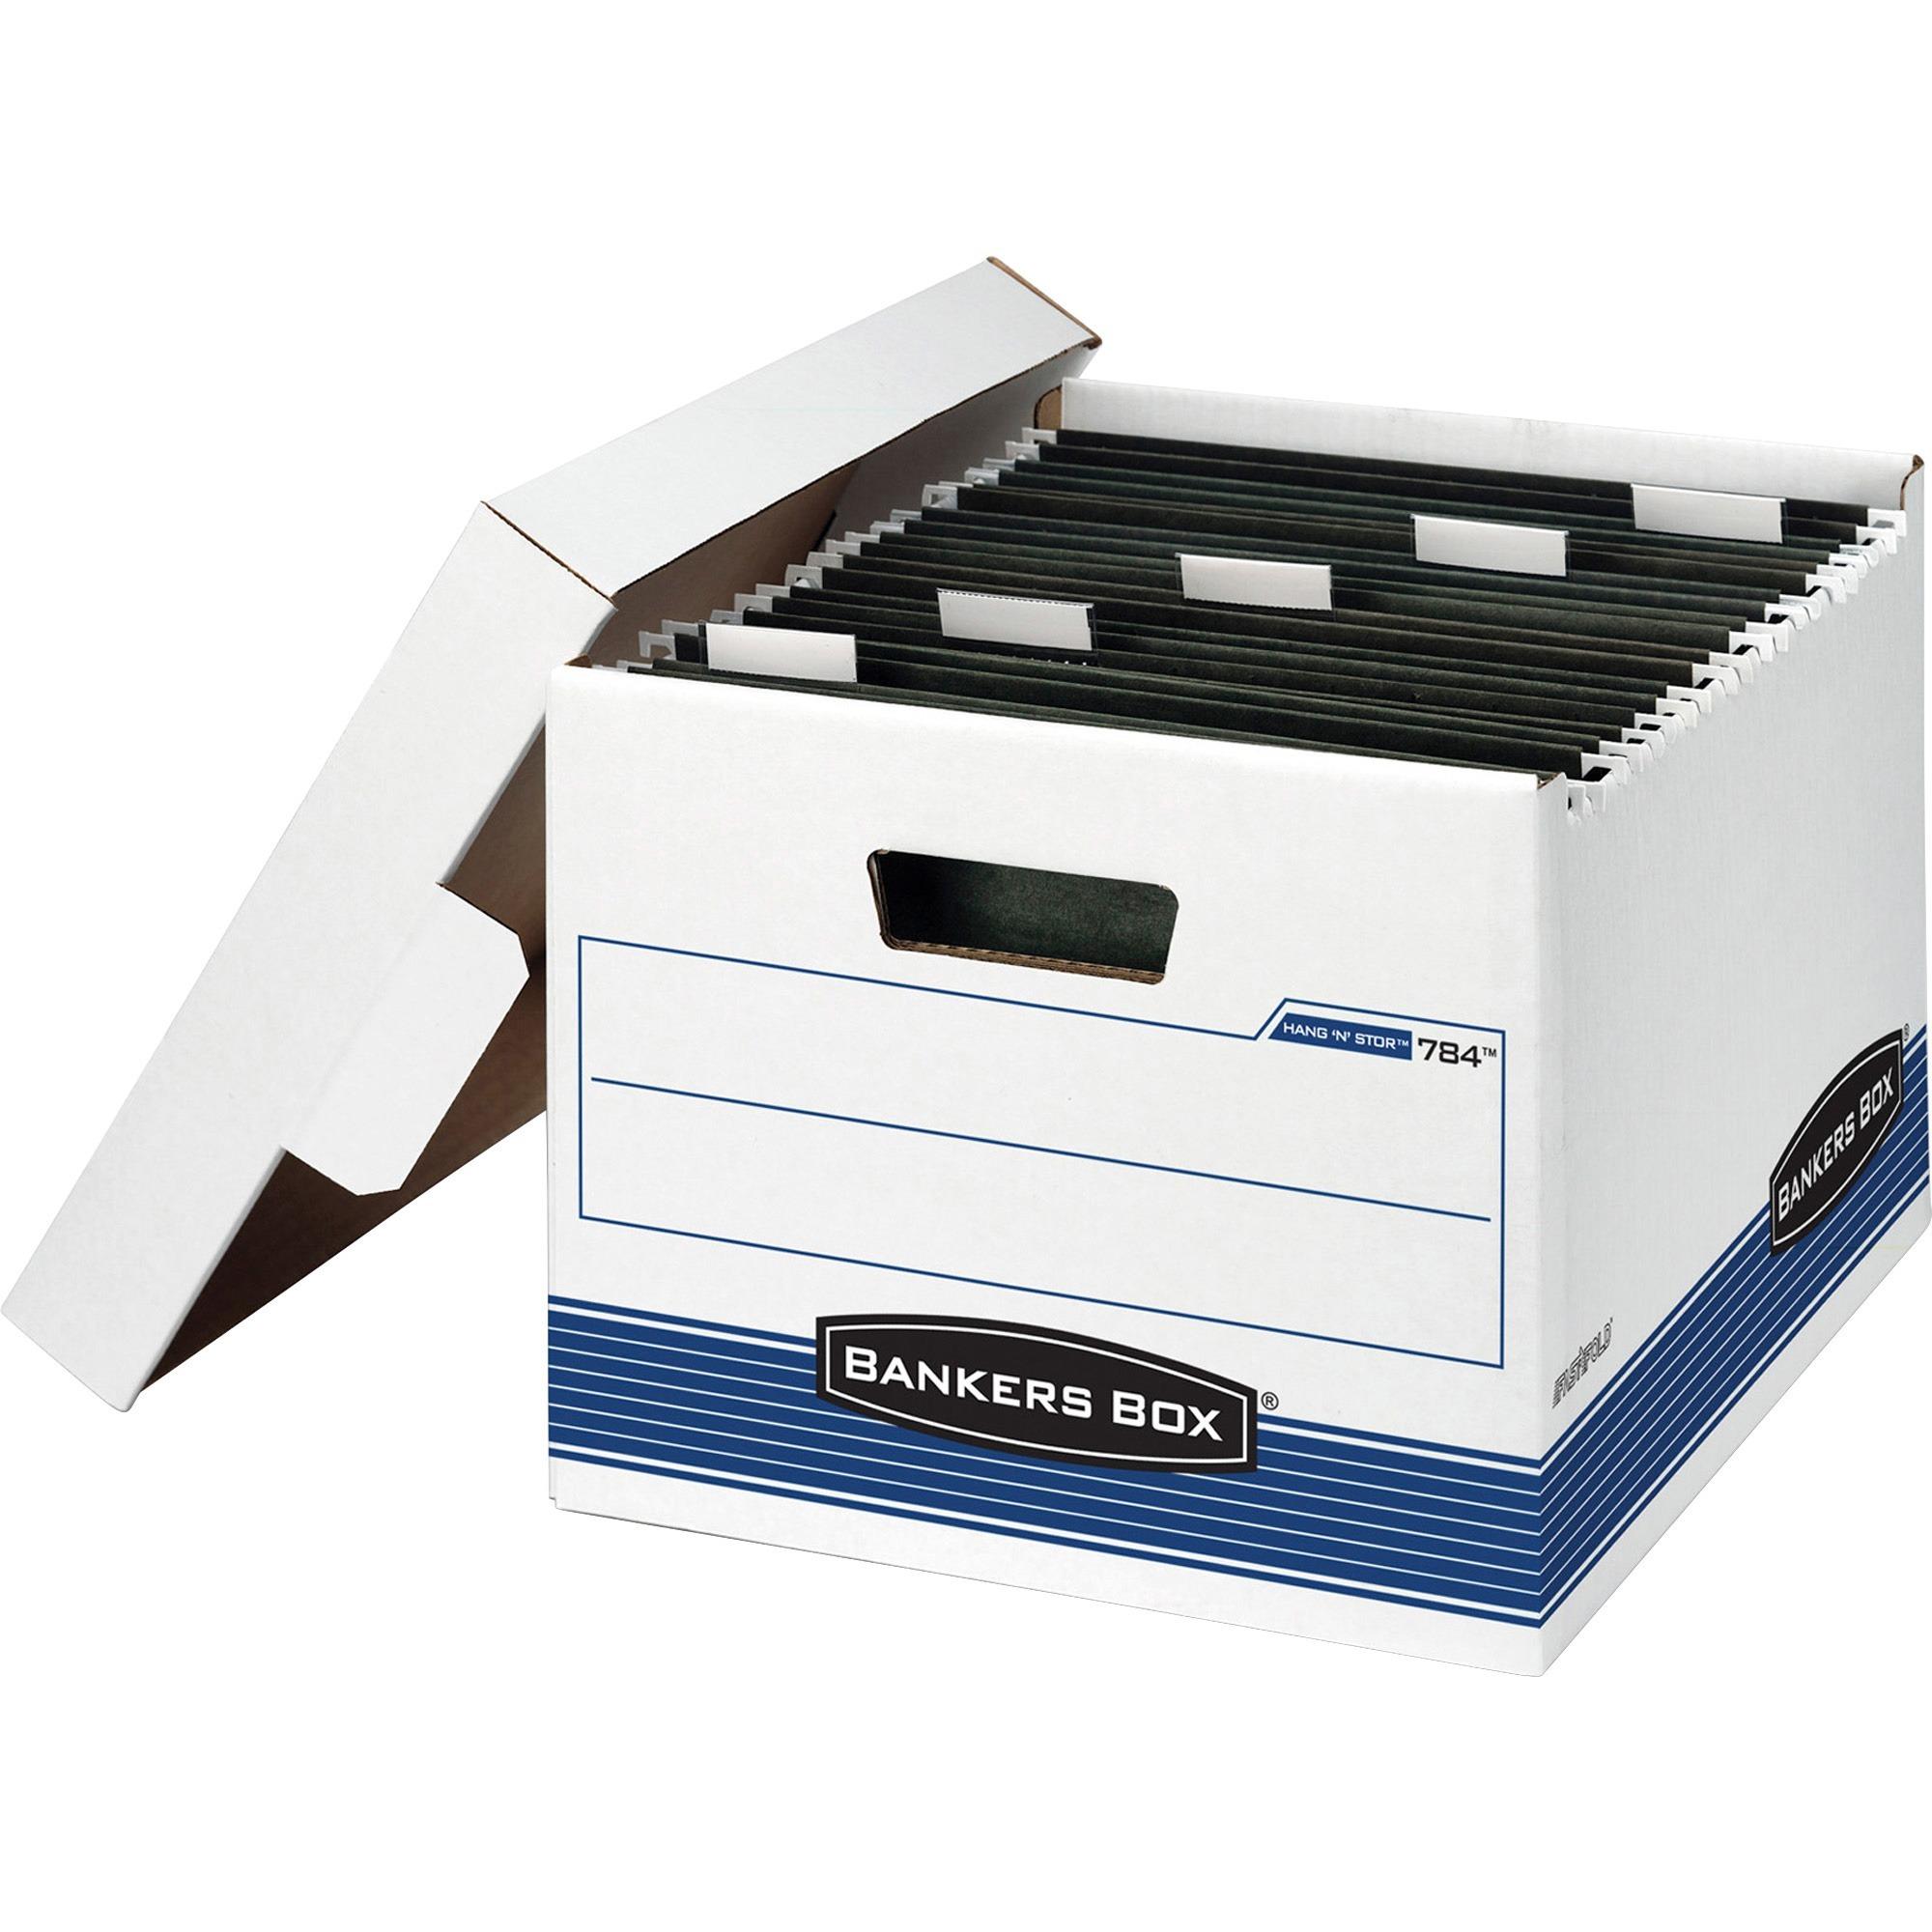 Bankers Box, FEL00784, Hang 'N' Stor Storage Boxes, 4 / Carton, Kraft,Green